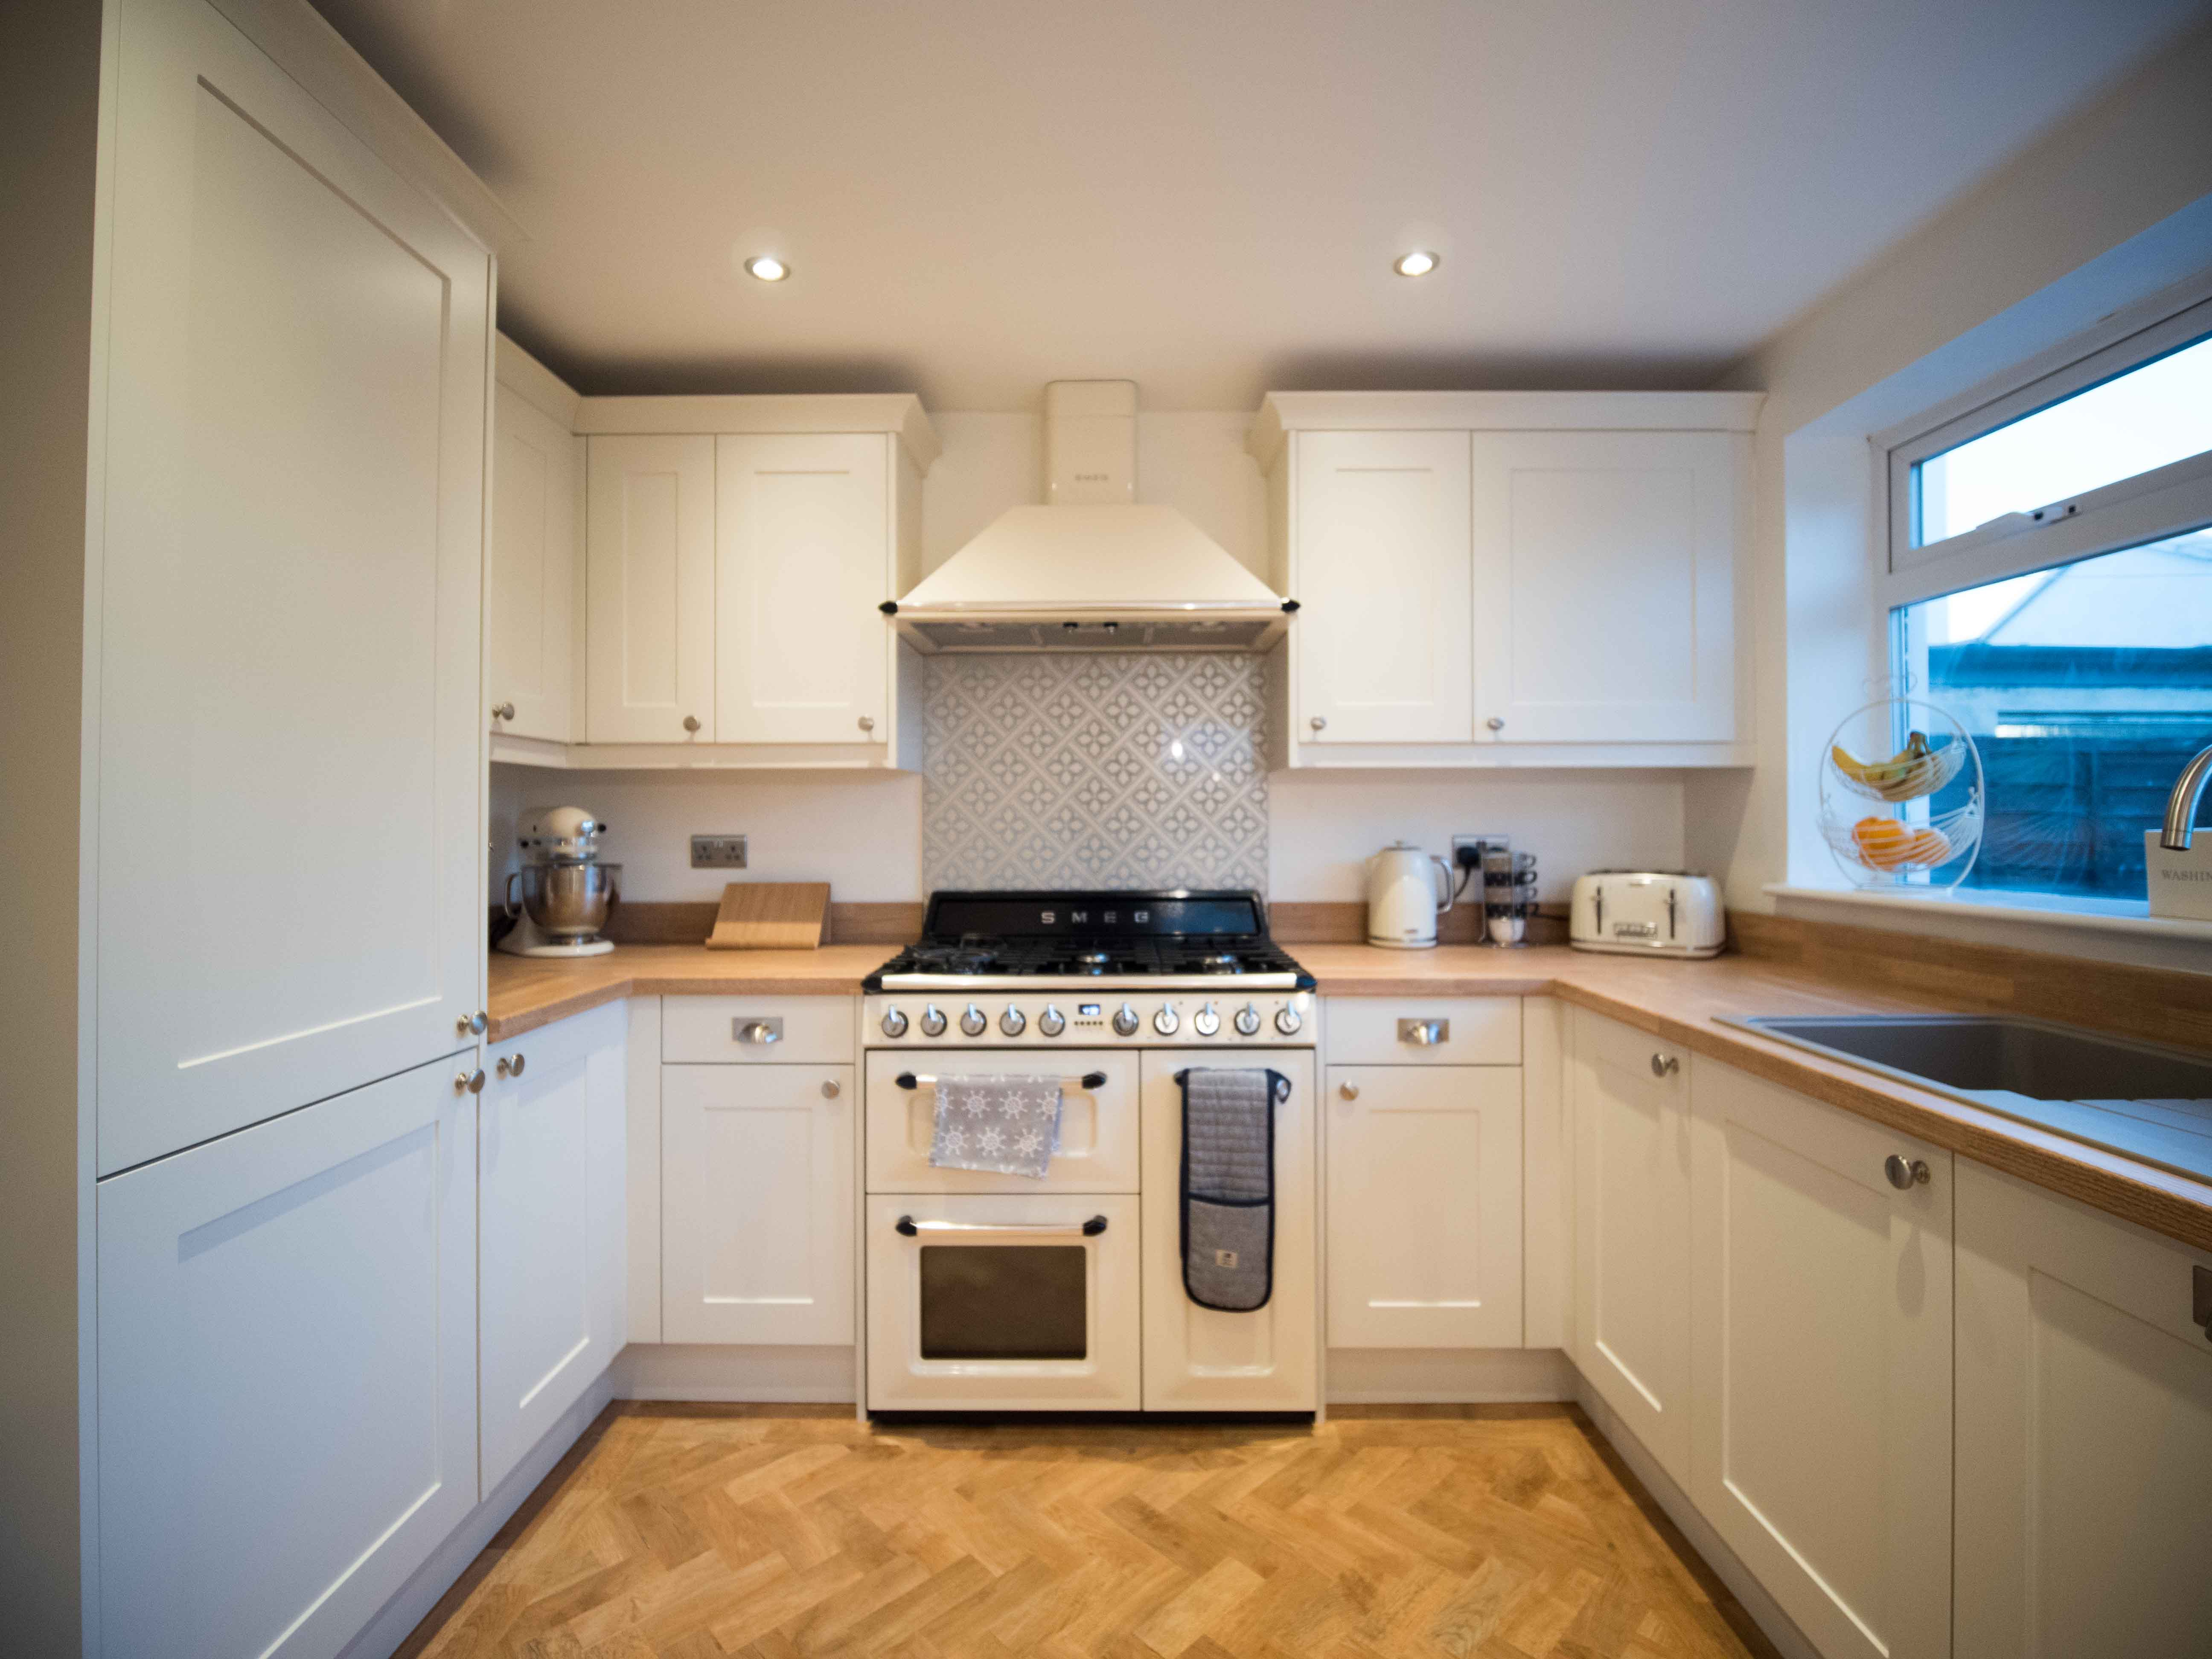 Oak parquet flooring & retro Smeg appliances   Beautiful Shaker ...